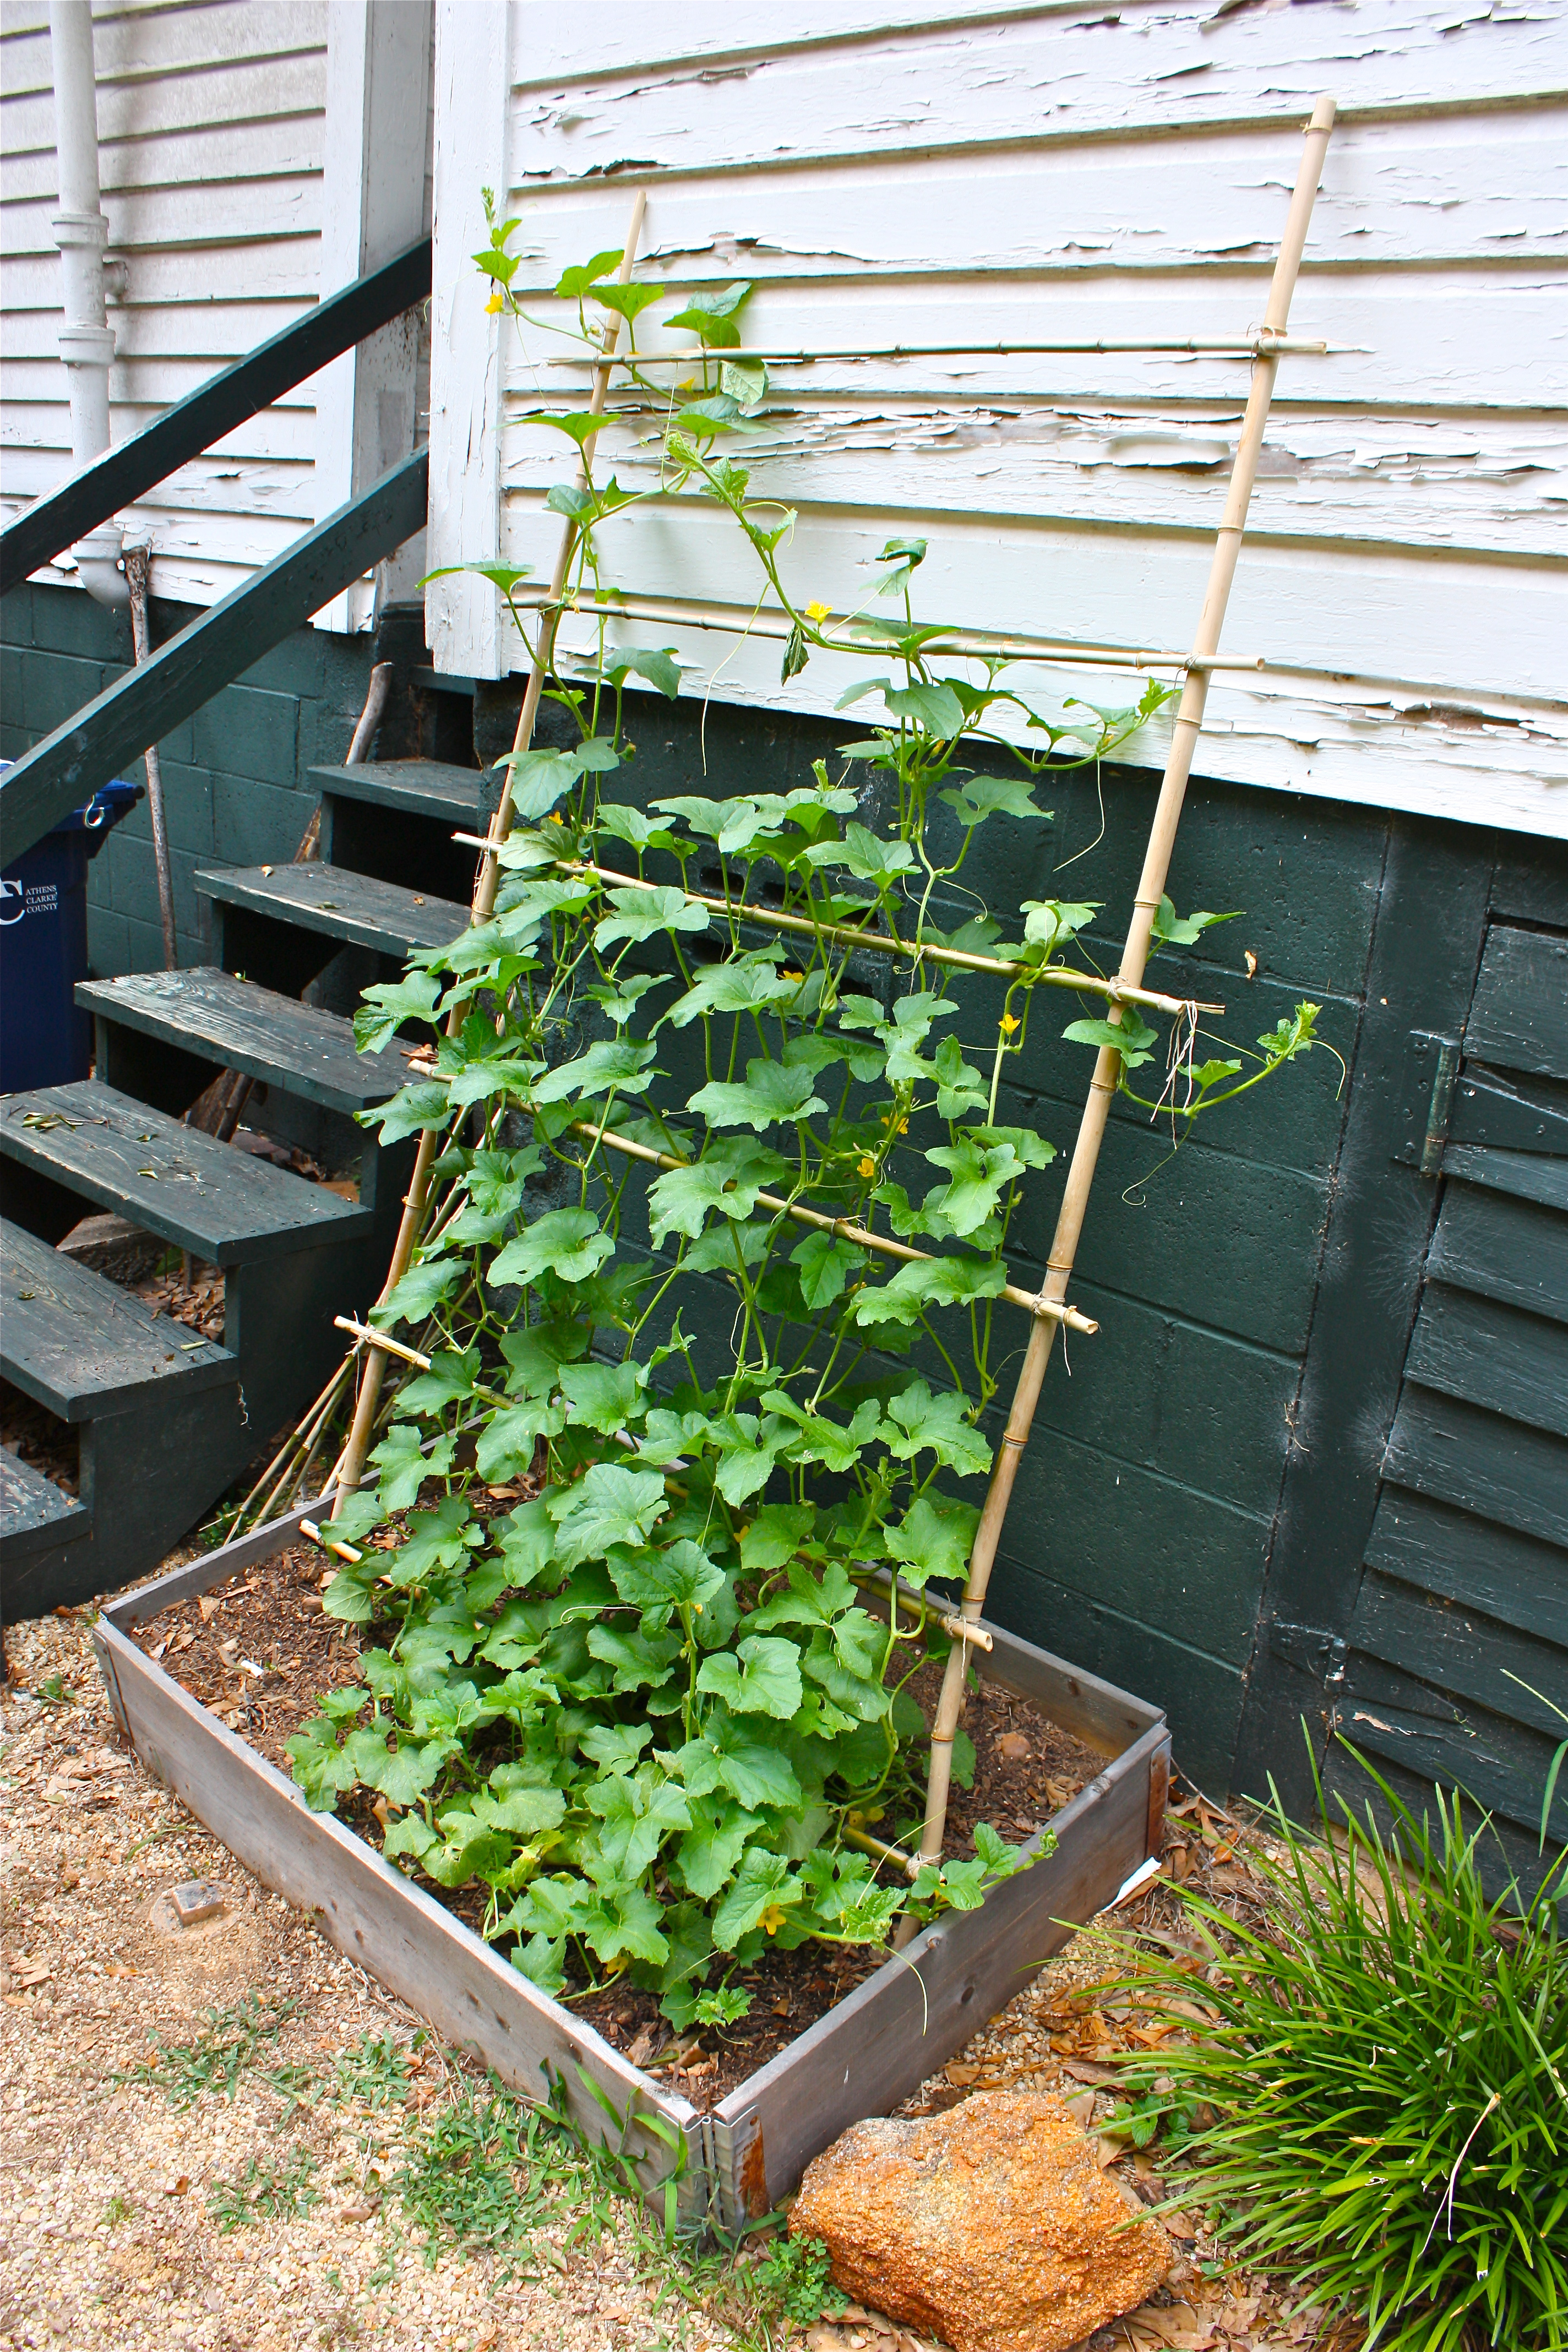 Hgtv Garden Ideas modern backyard design ideas with stone garden chair choosing great hgtv Garden Design With Honeydew Melon Vines On A Trellis Pedagogy Of The Plants With Hgtv Landscaping